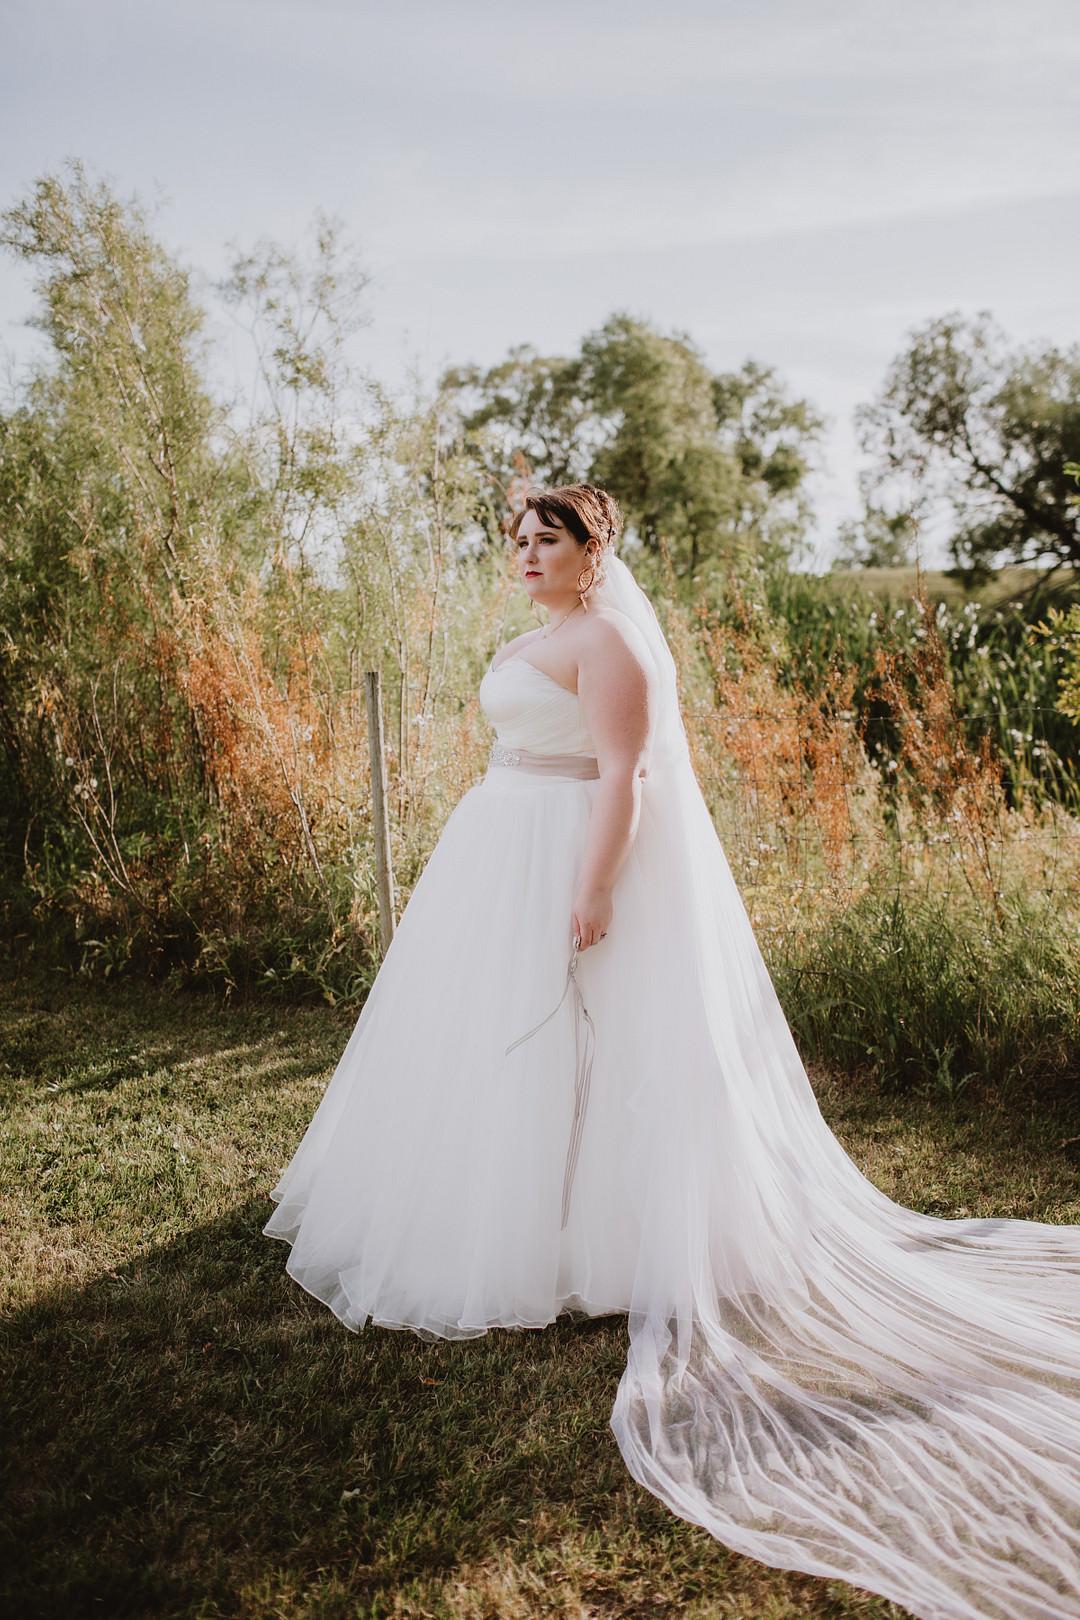 Dress Gown Bride Bridal Strapless Tulle Veil Fairytale Forest Wedding Christina W Kroeker Creative